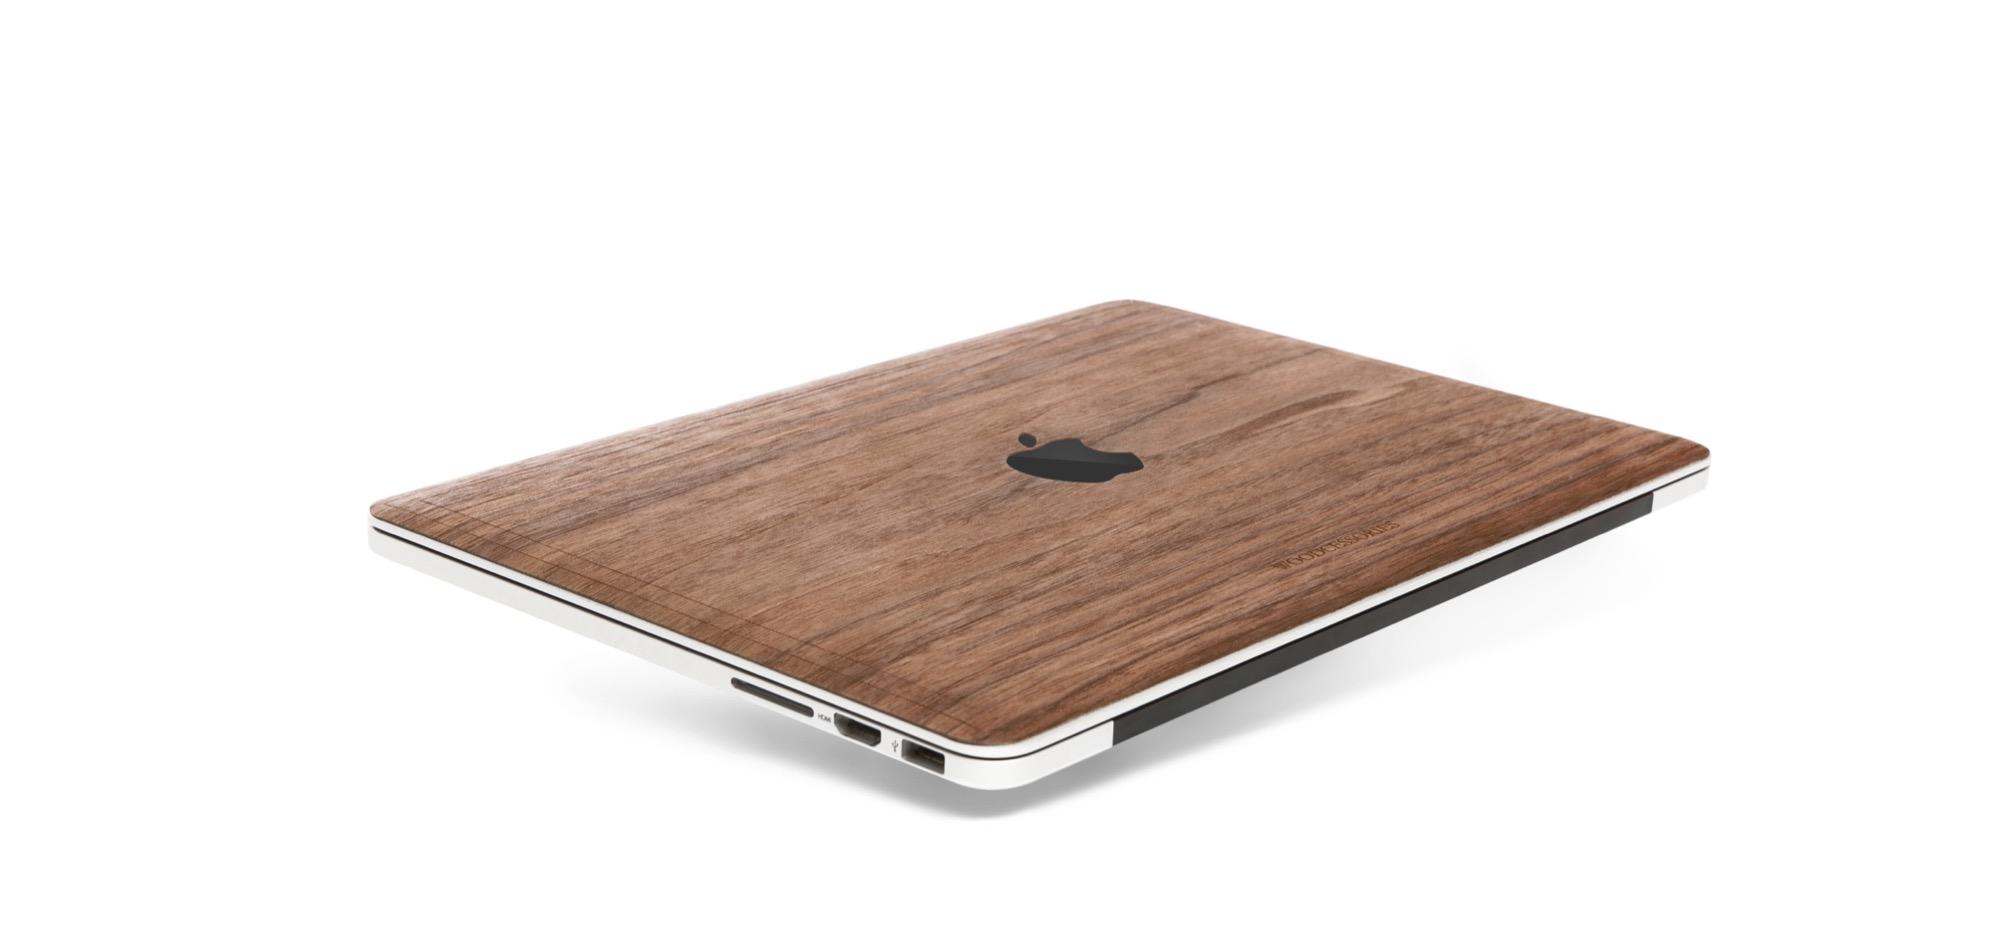 woodcessories-holz-macbook-cover-pro-touchbar-2016-15-13-sticker-klebefolie-decal-woodFolie2